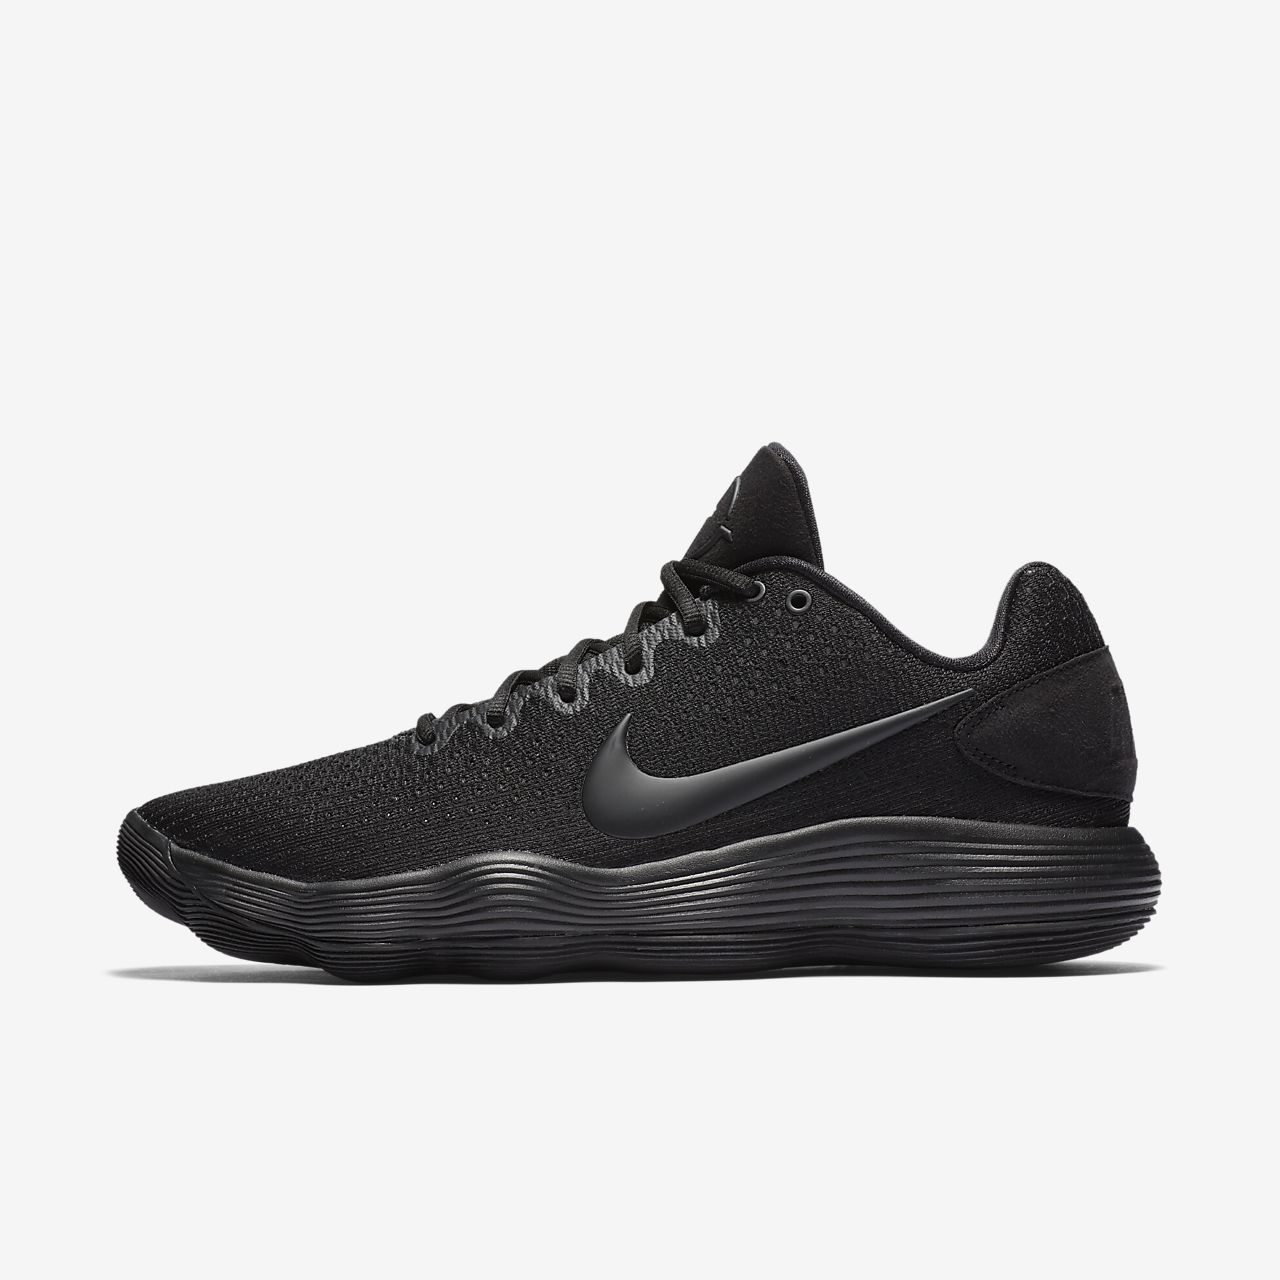 9faea62d15f22 ... nike react hyperdunk 2017 low mens basketball shoe